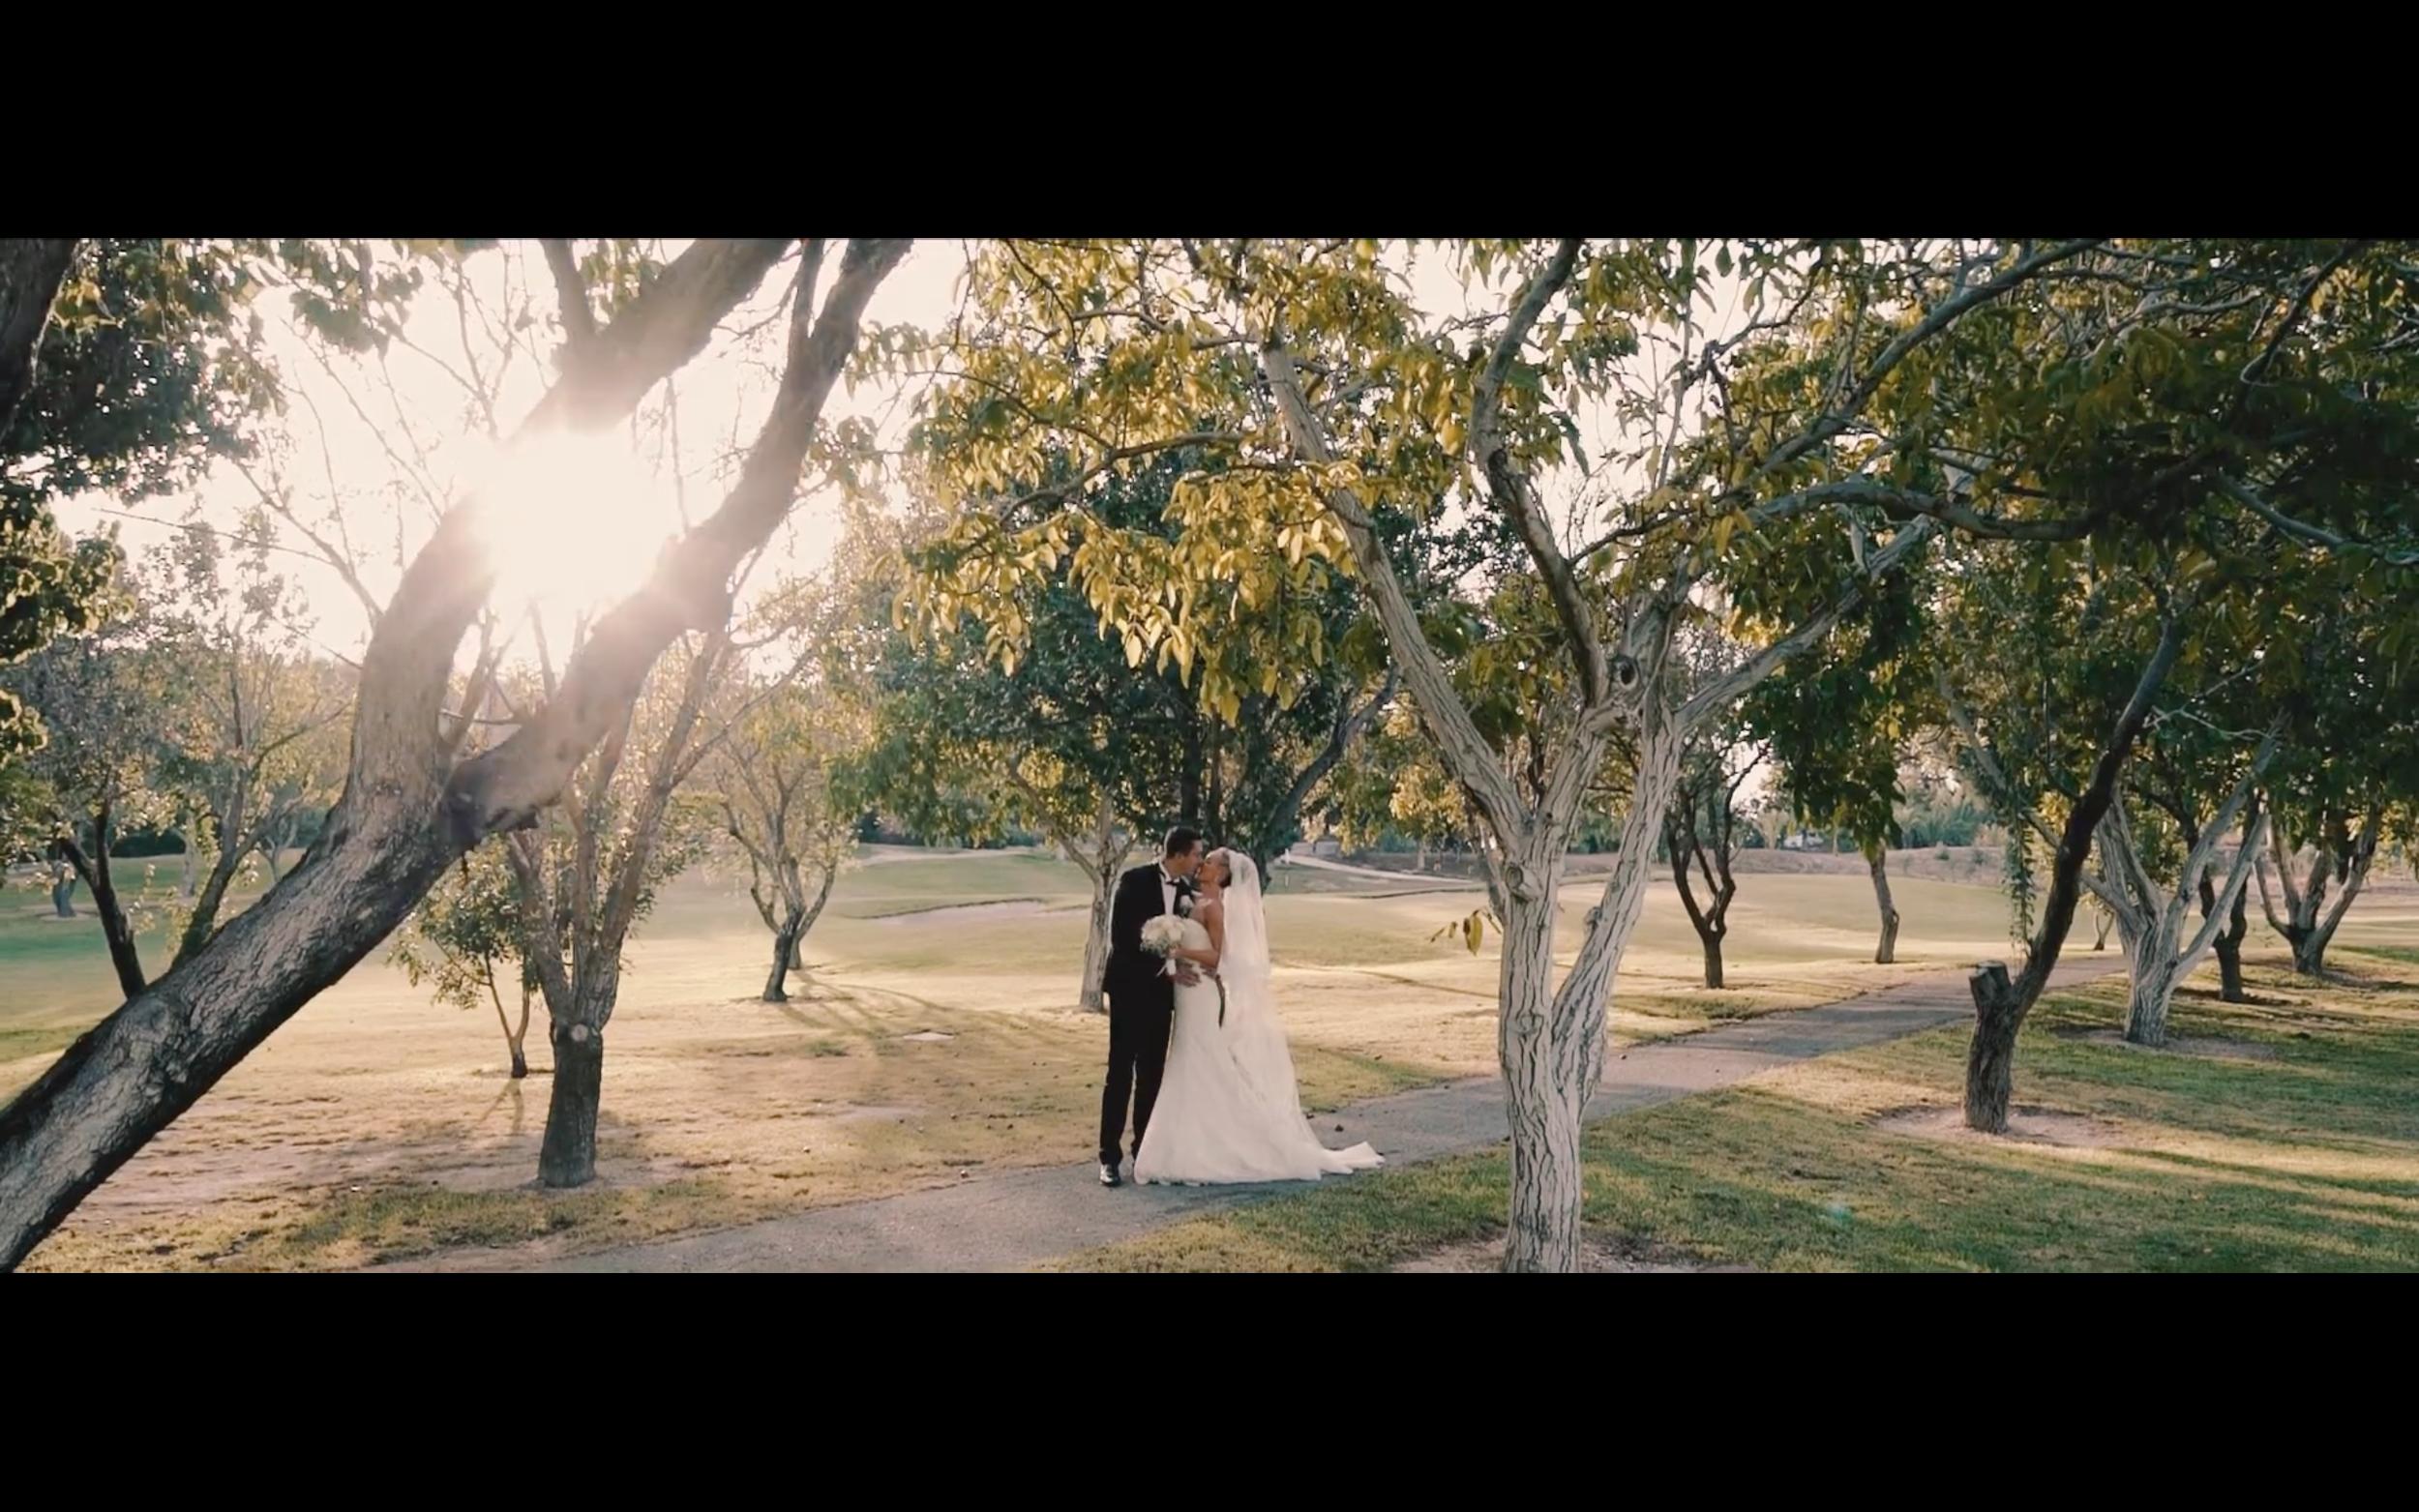 experienced and professional wedding photographers Larnaca